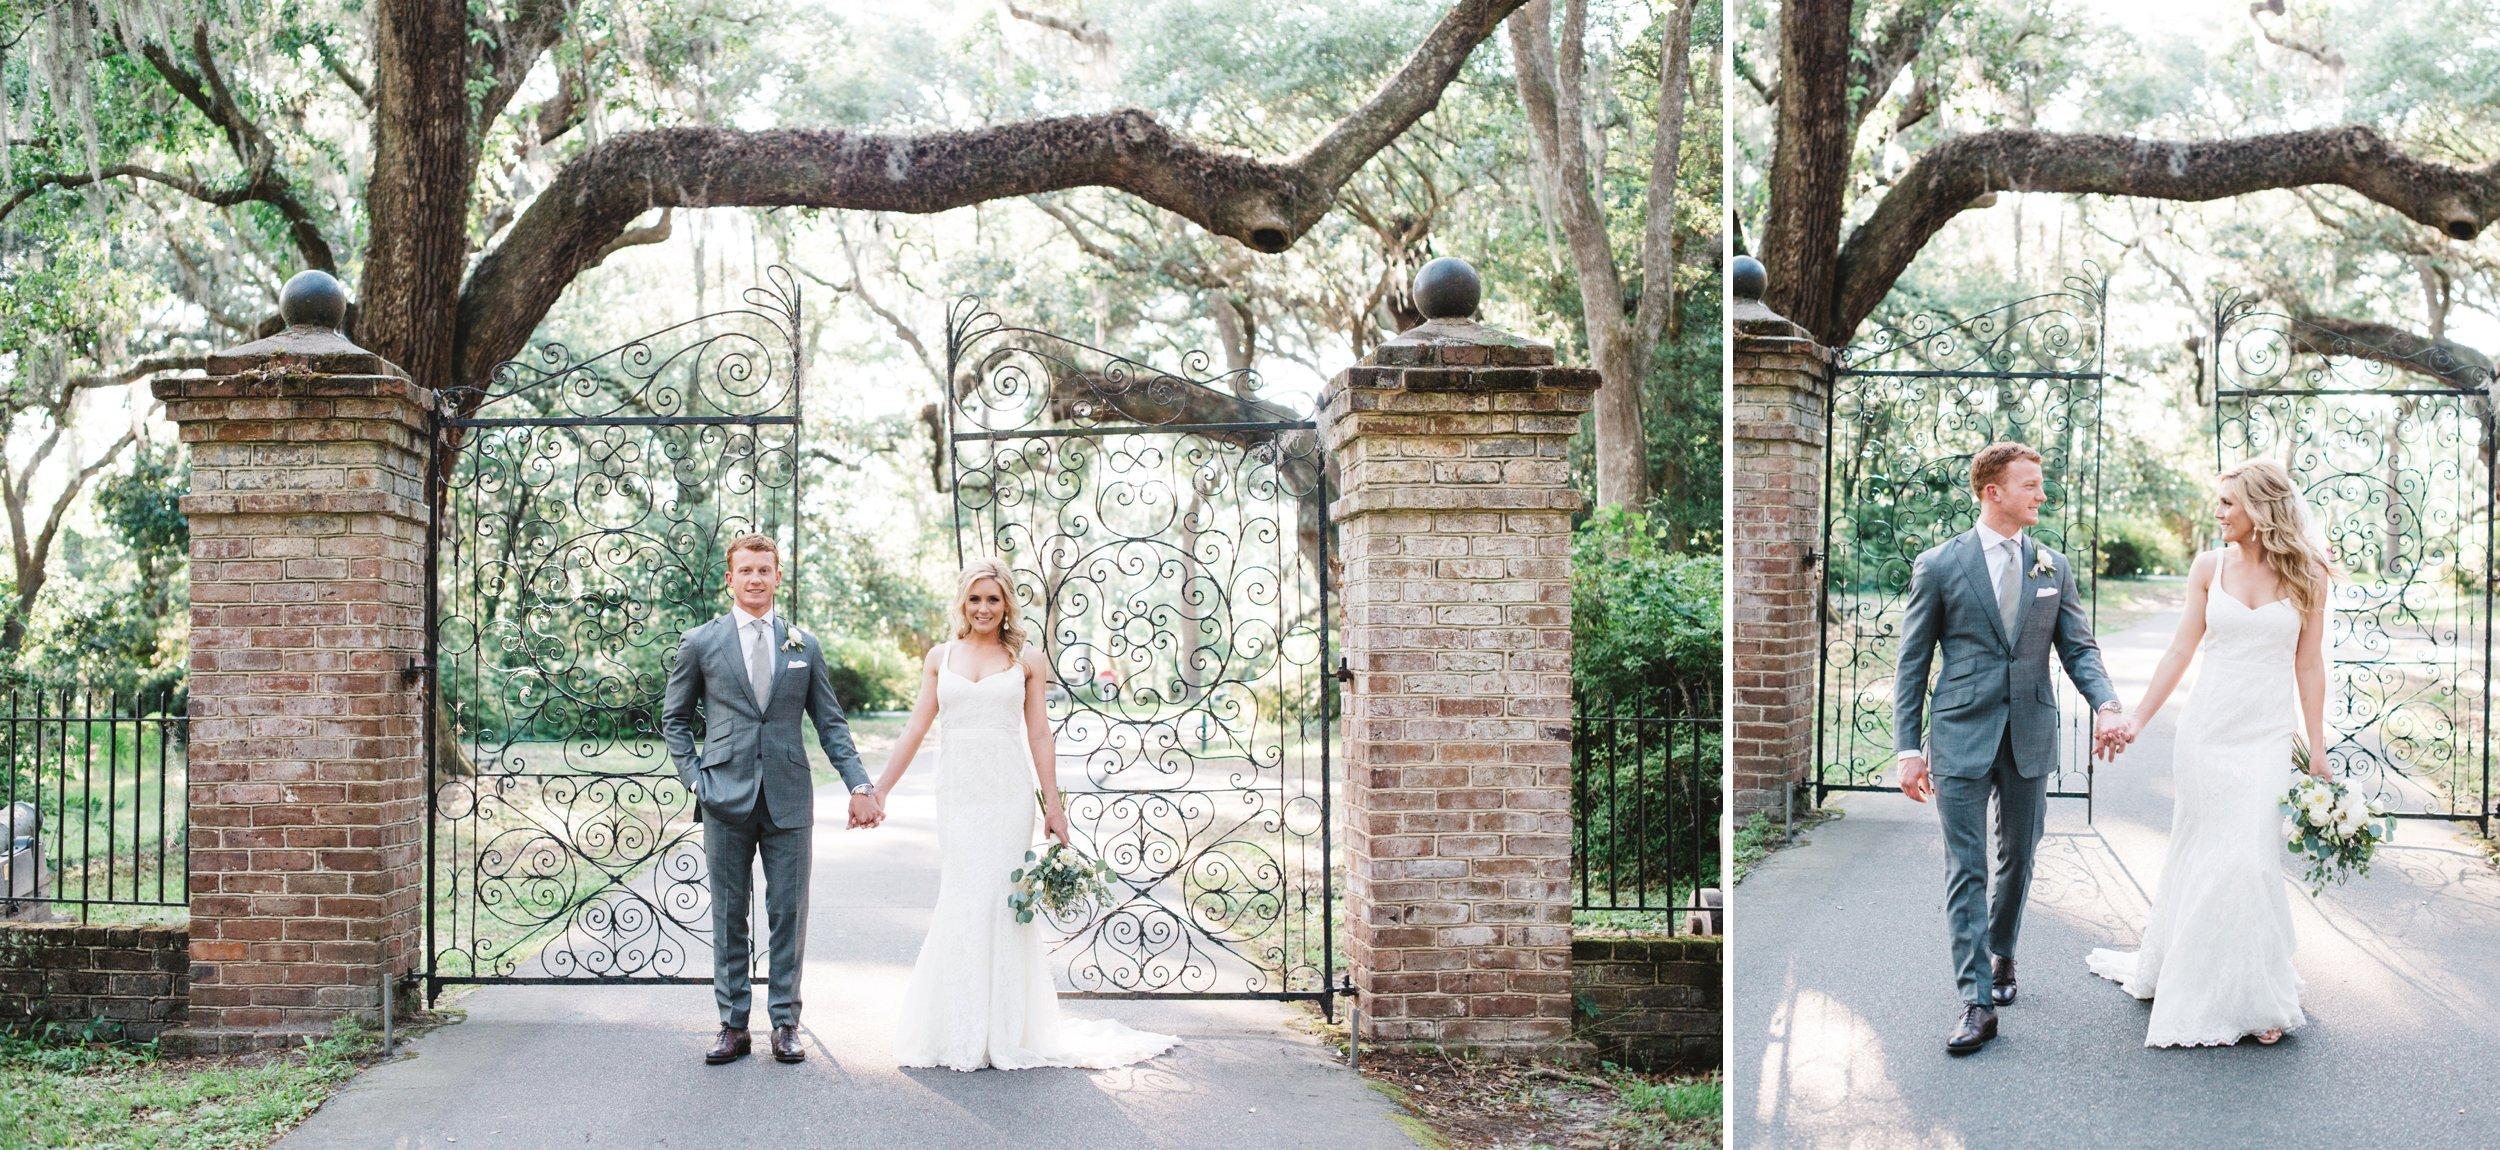 legare-waring-house-wedding-38.jpg